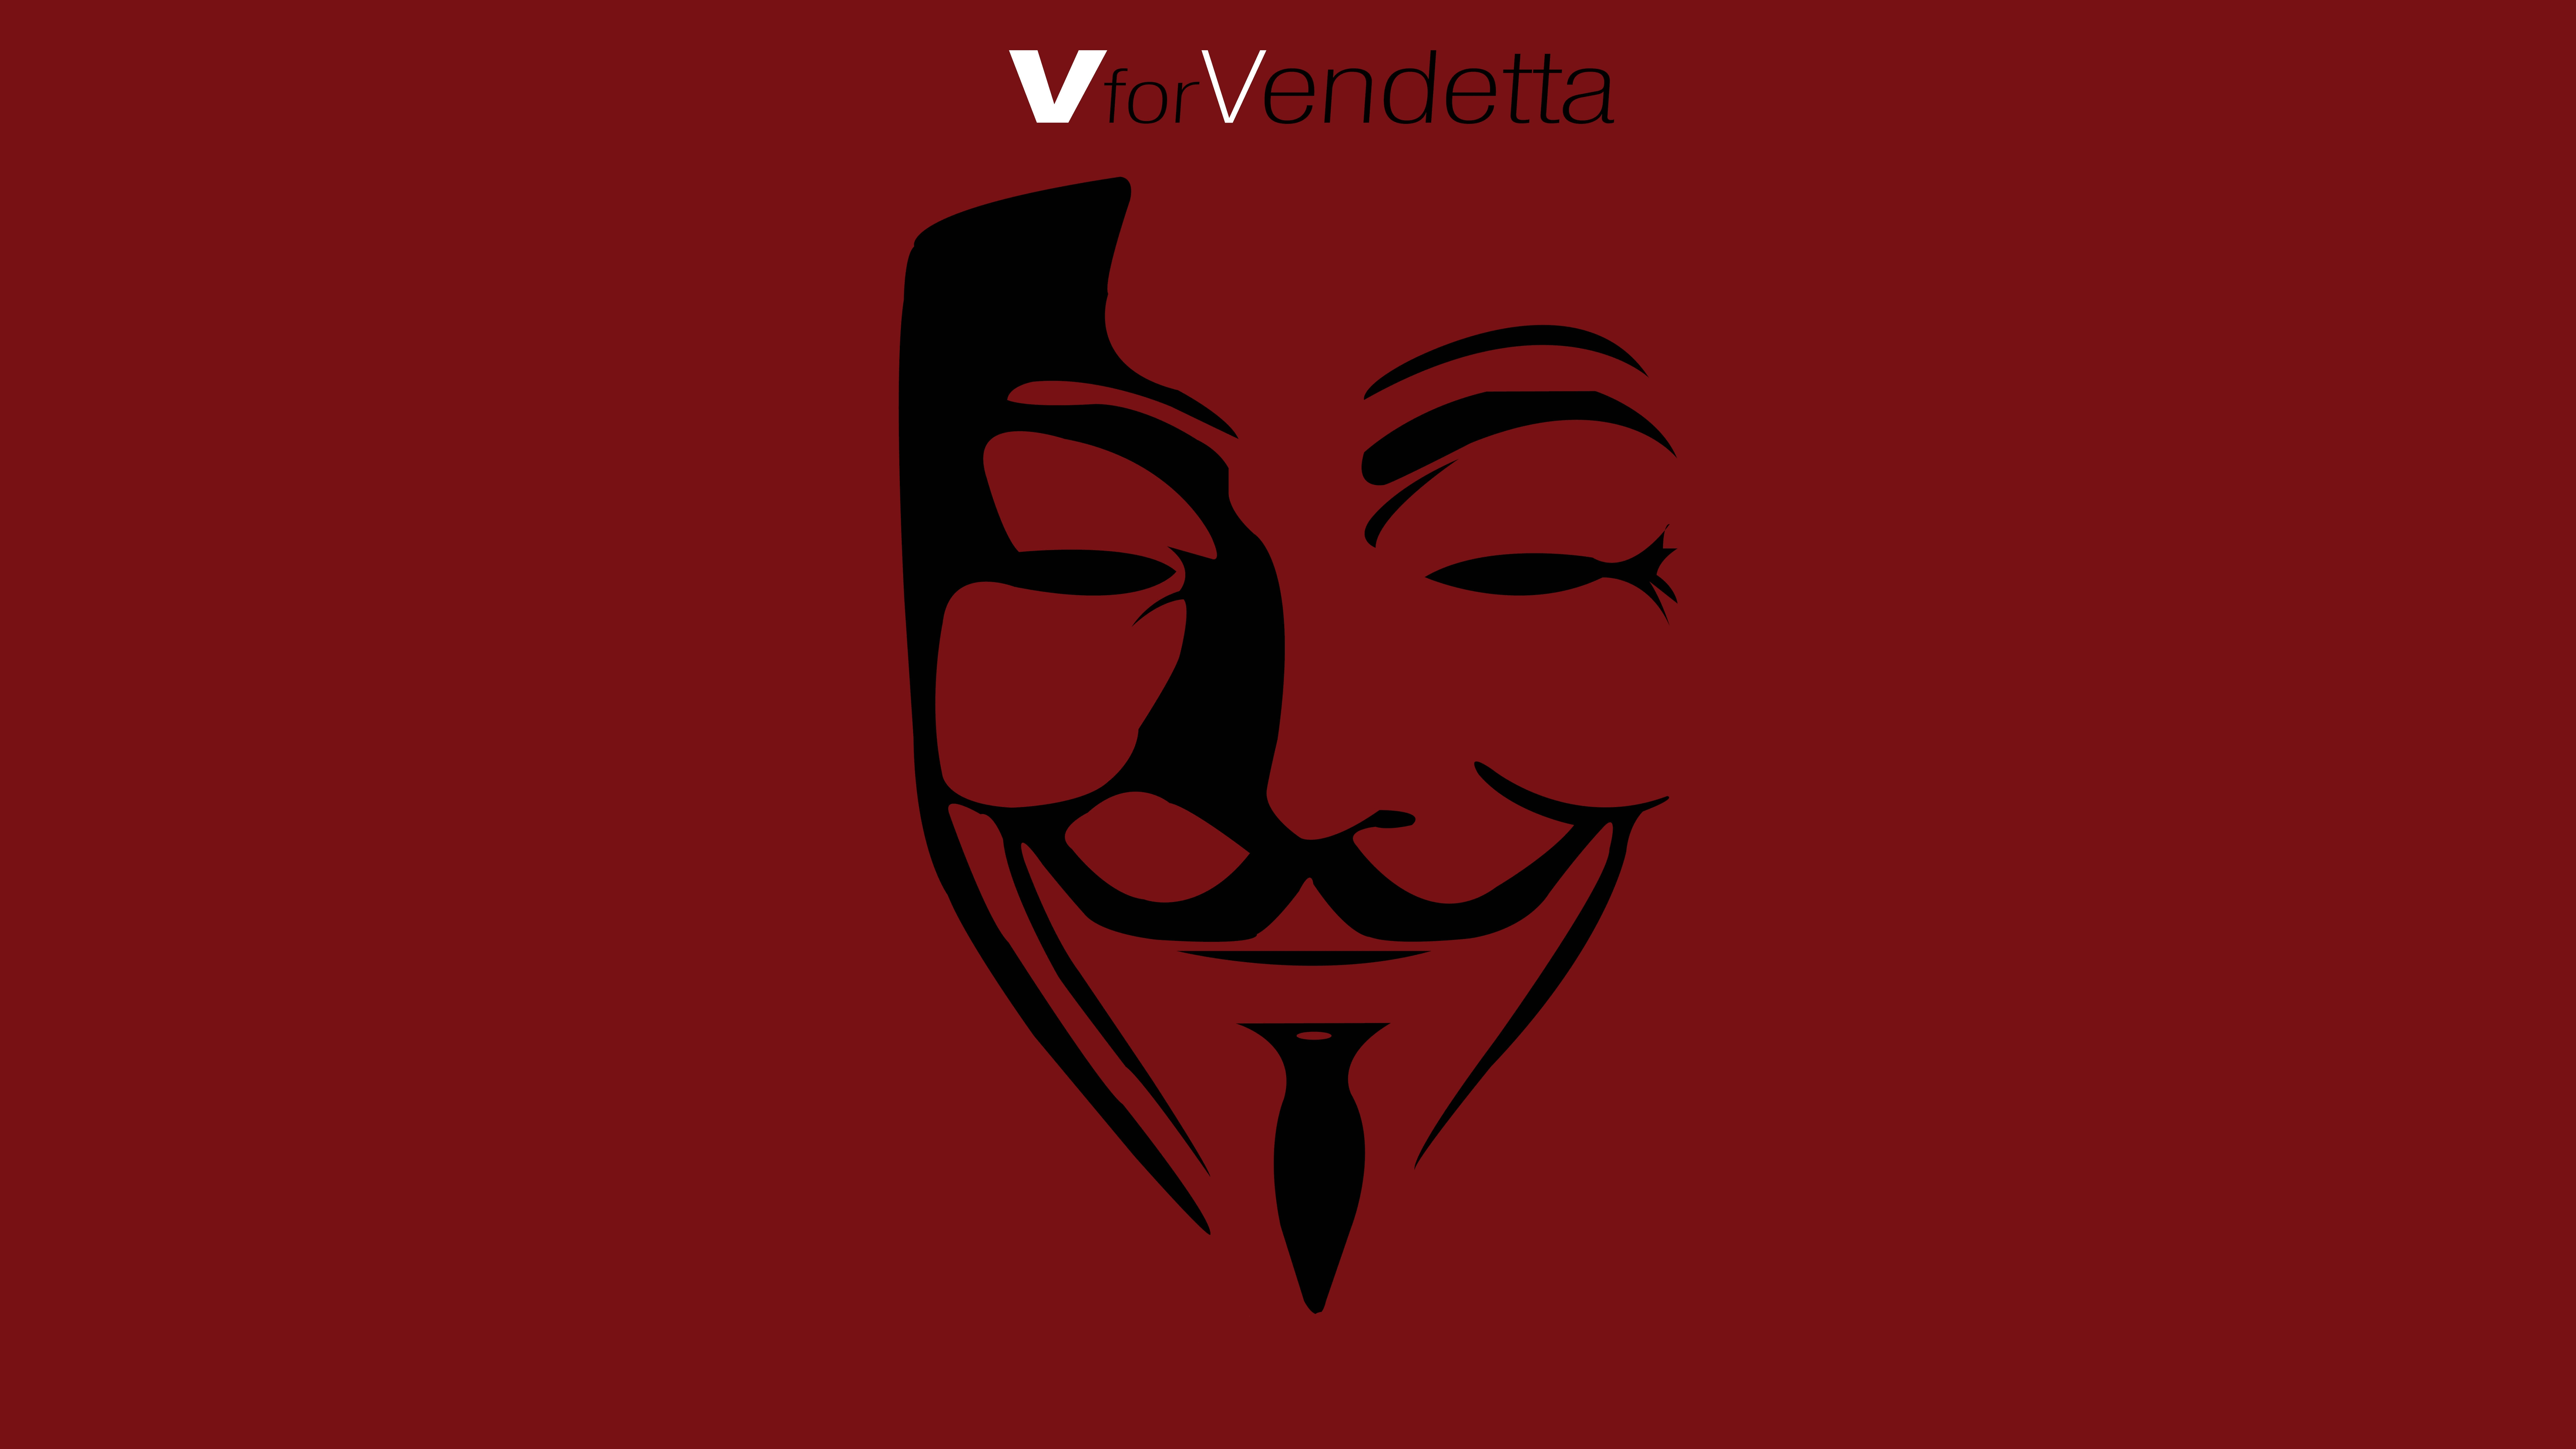 3 4k Ultra Hd V For Vendetta Wallpapers Background Images